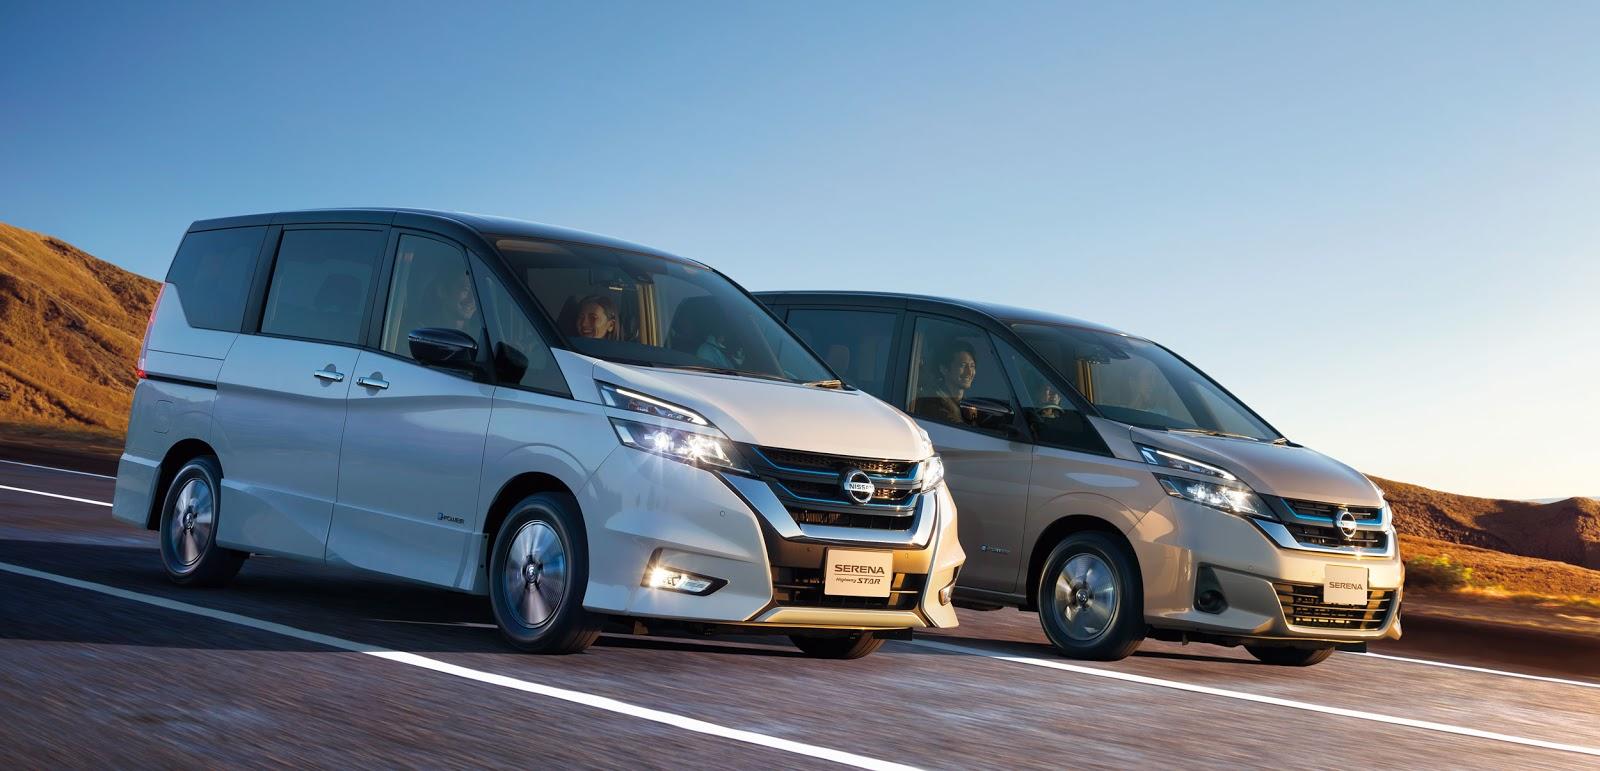 Nissan Serena e POWER 2 Βραβείο τεχνολογίας για το e-POWER της Nissan Electric cars, Nissan, βραβείο, Τεχνολογία